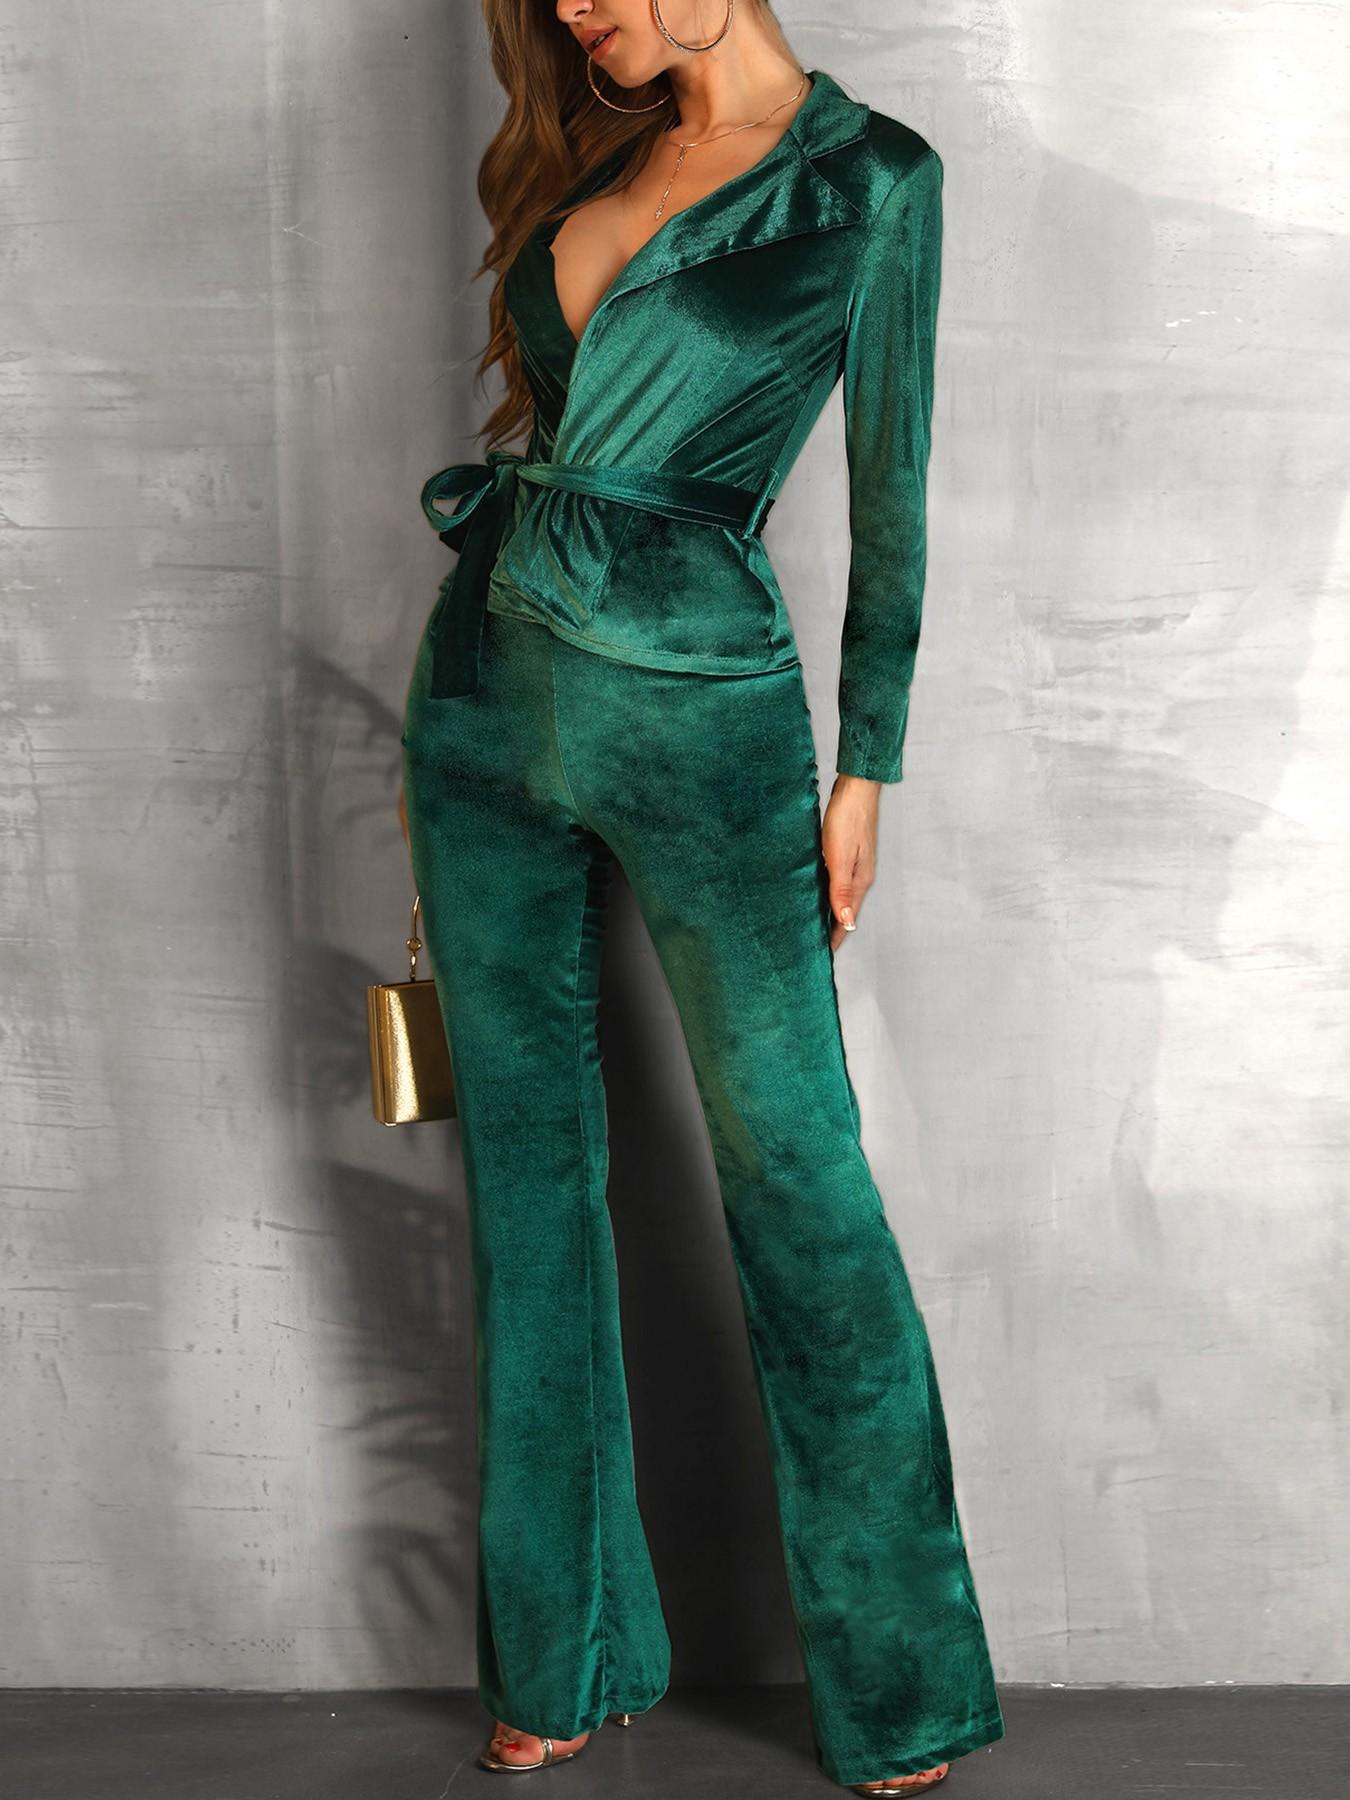 boutiquefeel / Velvet Wrapped Tied Waist Suit Sets